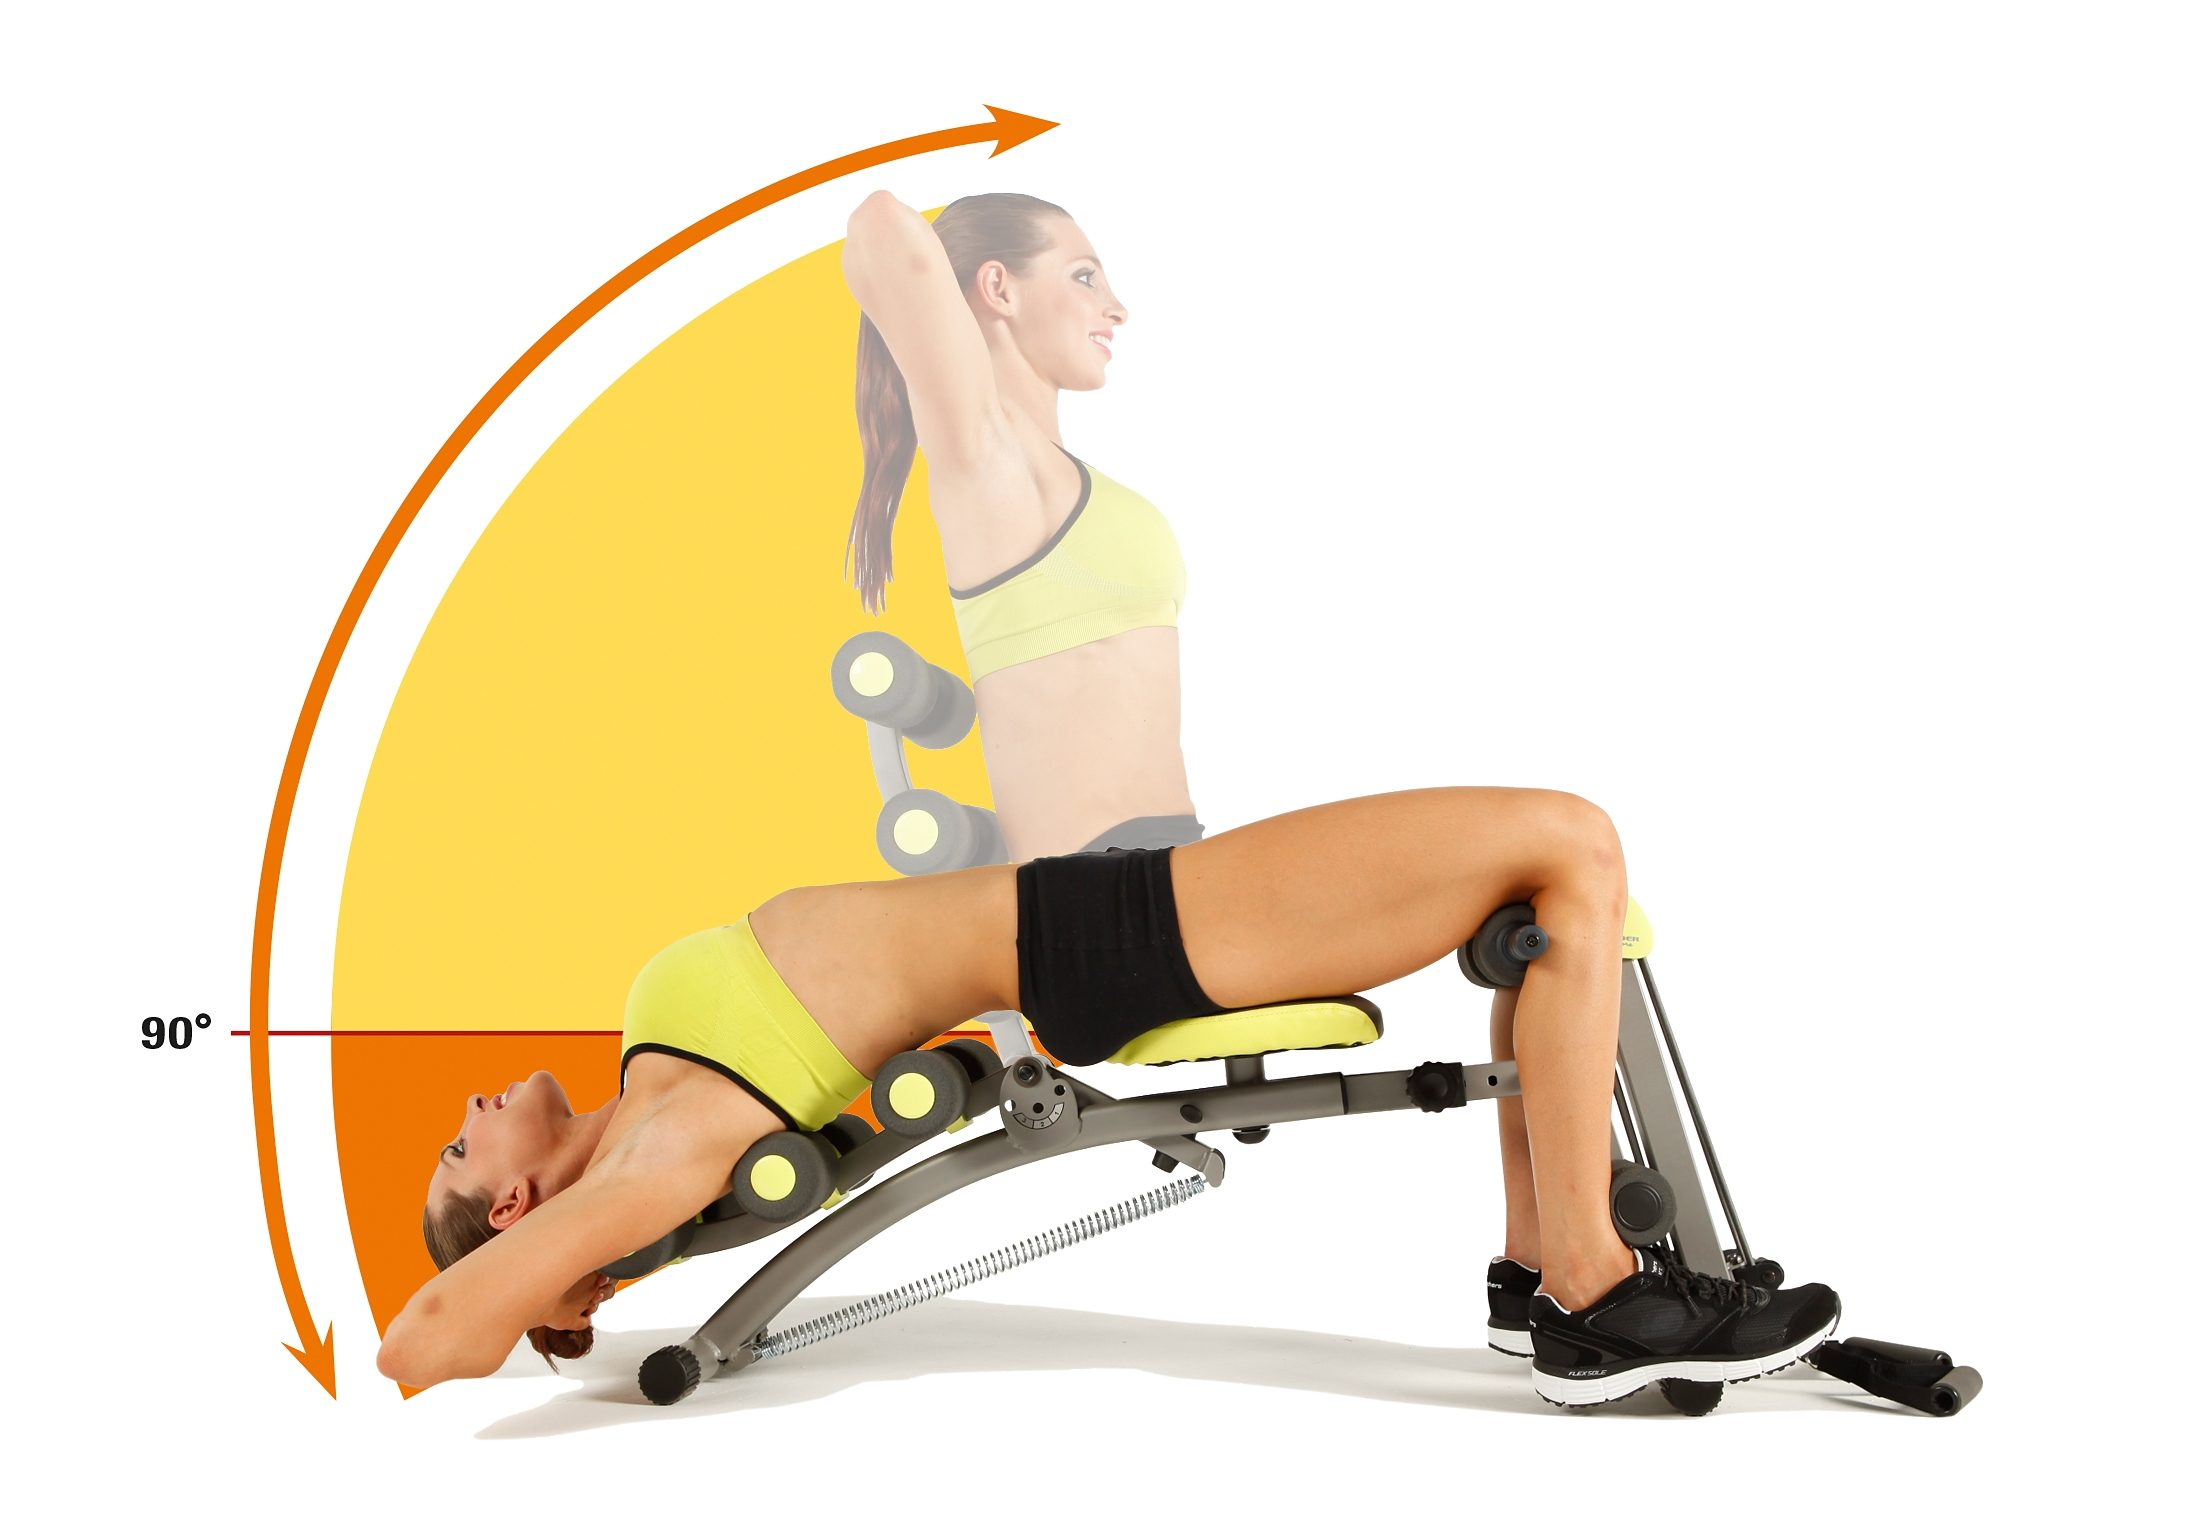 Ganzkörper-Fitnessgerät Heimtrainer, Wonder Core 2